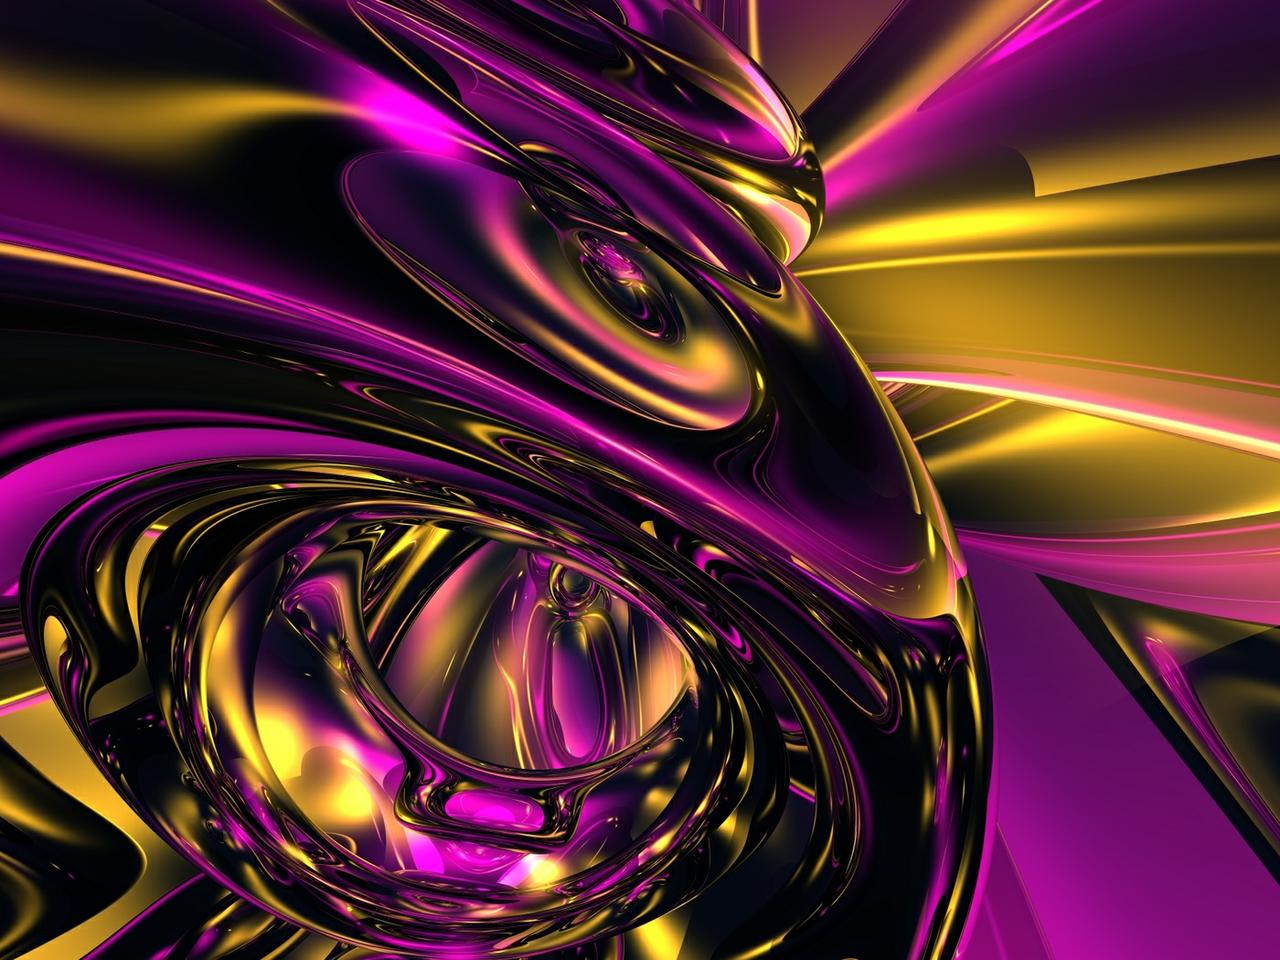 purple and gold wallpaper wallpapersafari. Black Bedroom Furniture Sets. Home Design Ideas